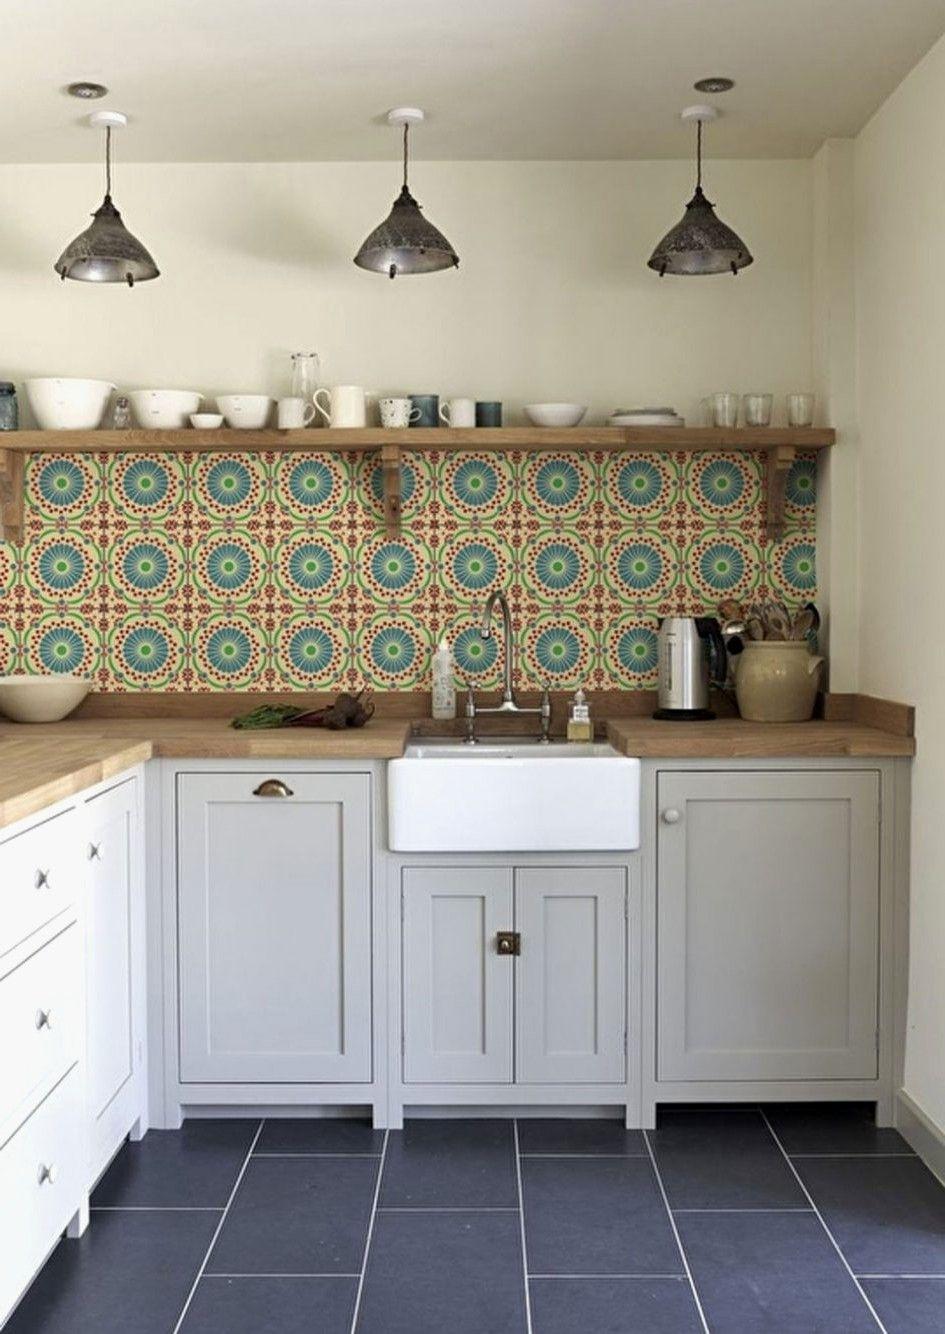 Design Simple Modern Kitchen Retro Tiles Large Wall Fresh